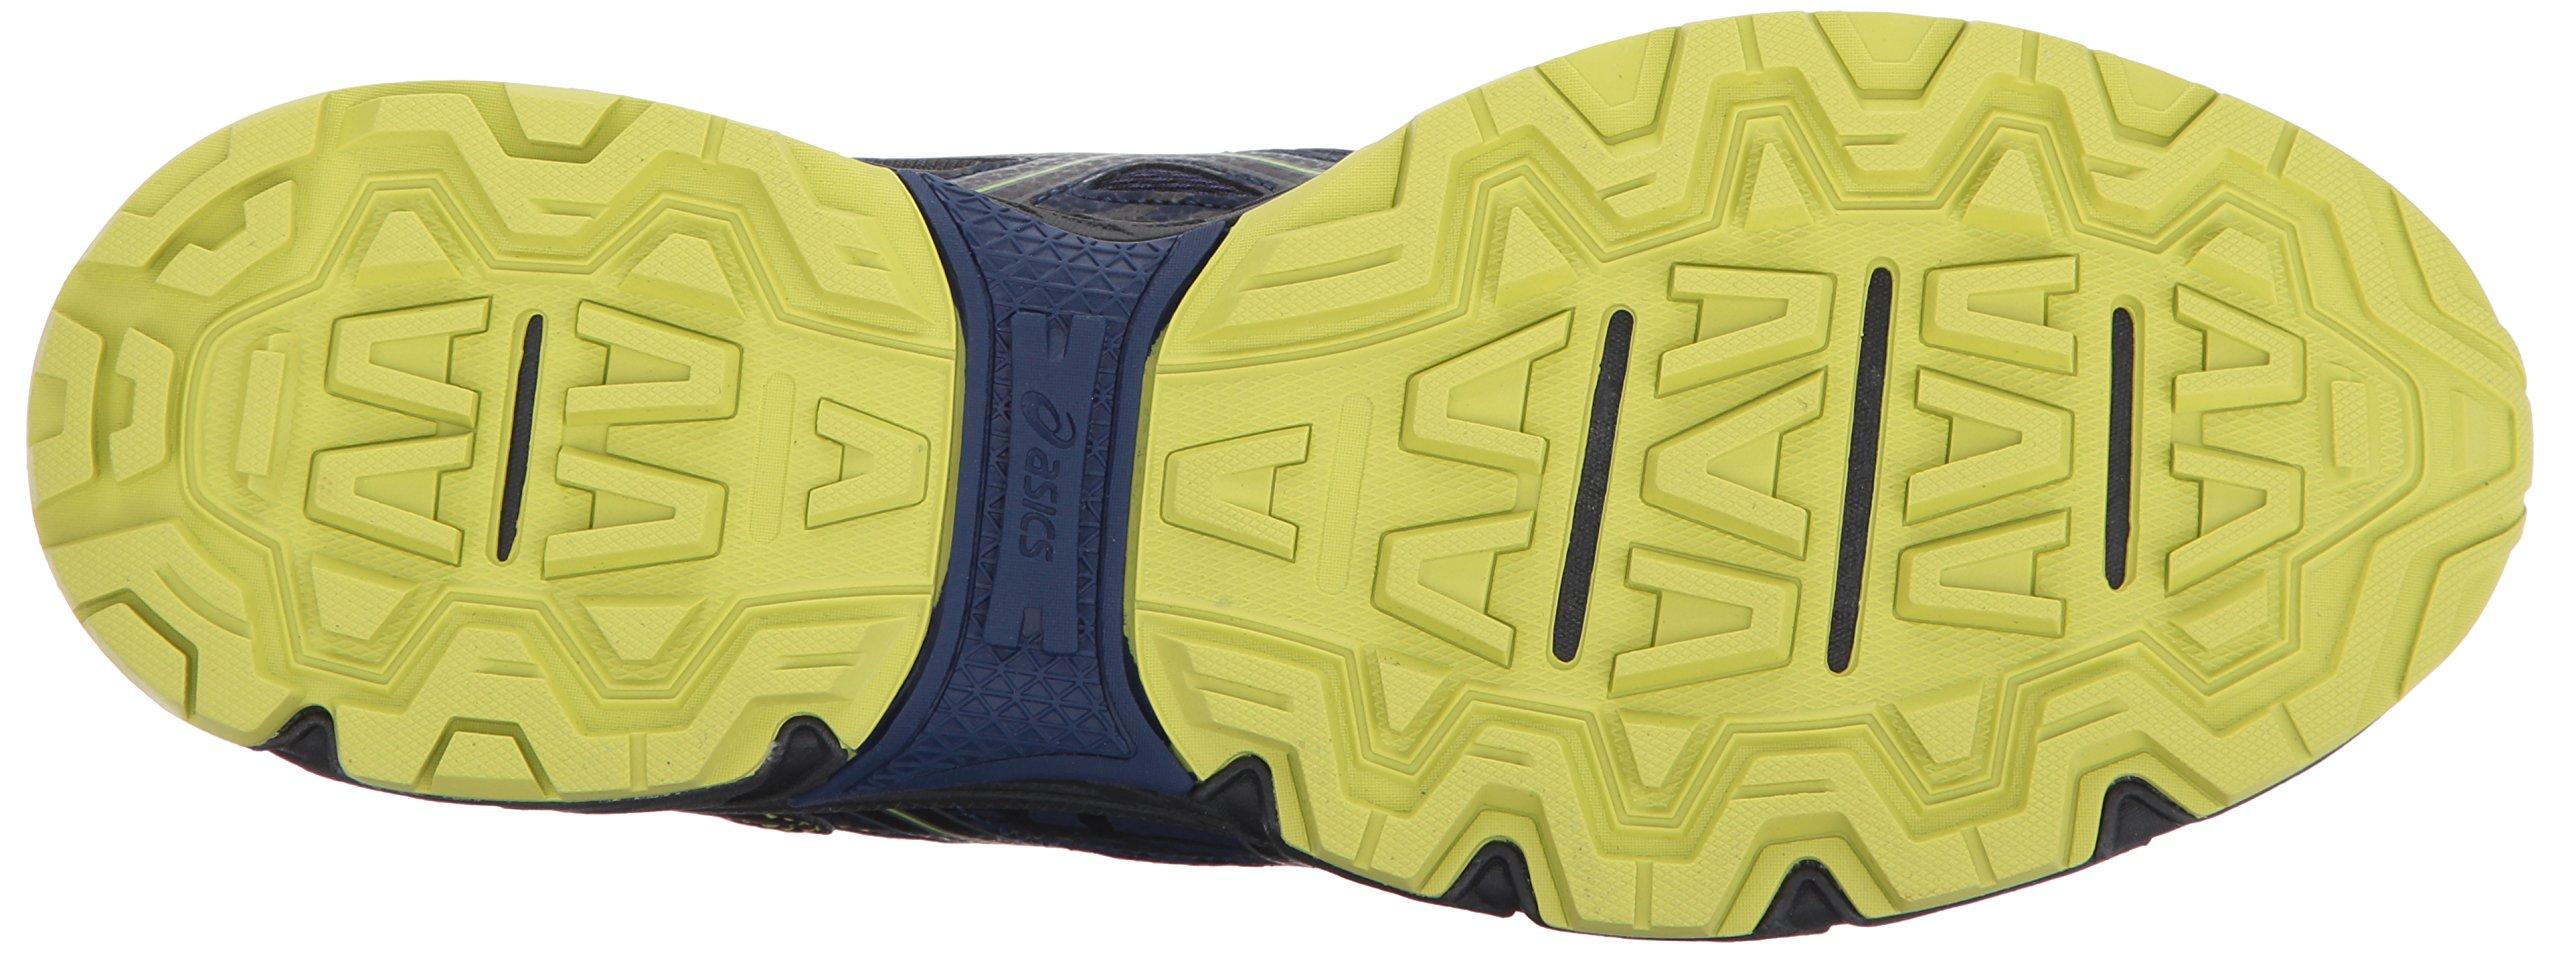 ASICS Mens Gel-Venture 6 Running Shoe, Indigo Blue/Black/Energy Green, 7 Medium US by ASICS (Image #3)